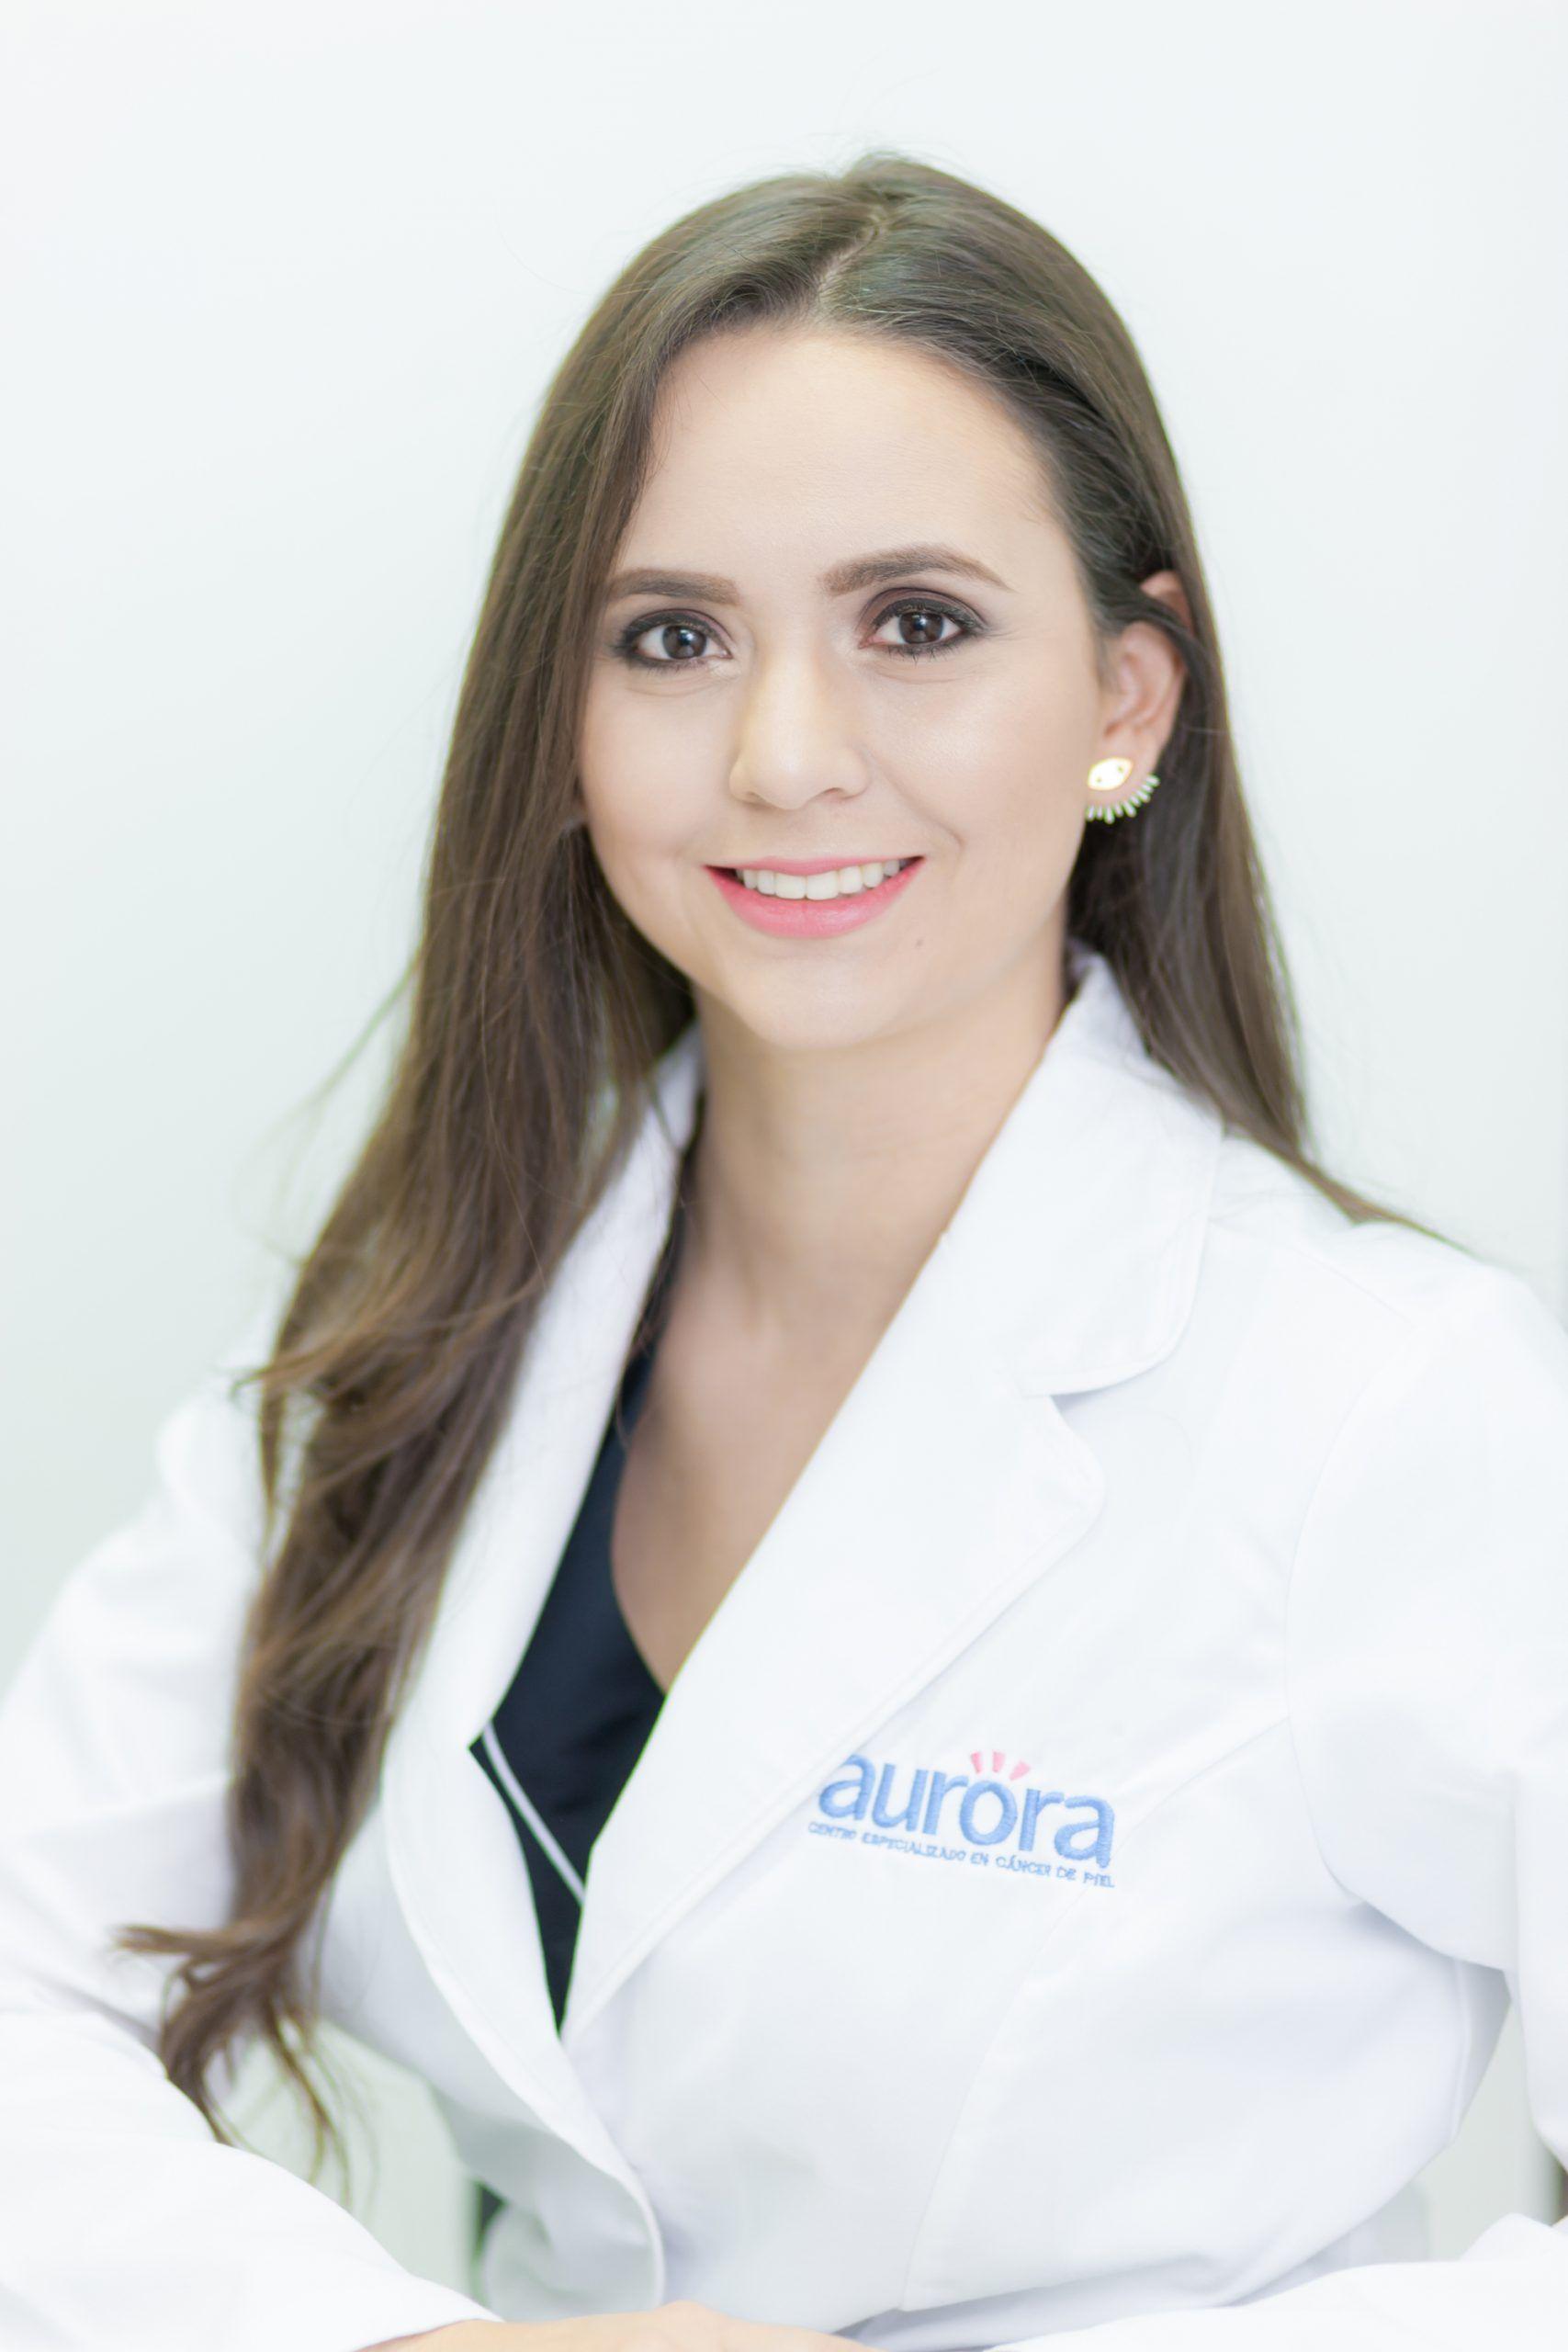 Doctora Melisa Montes Palacio